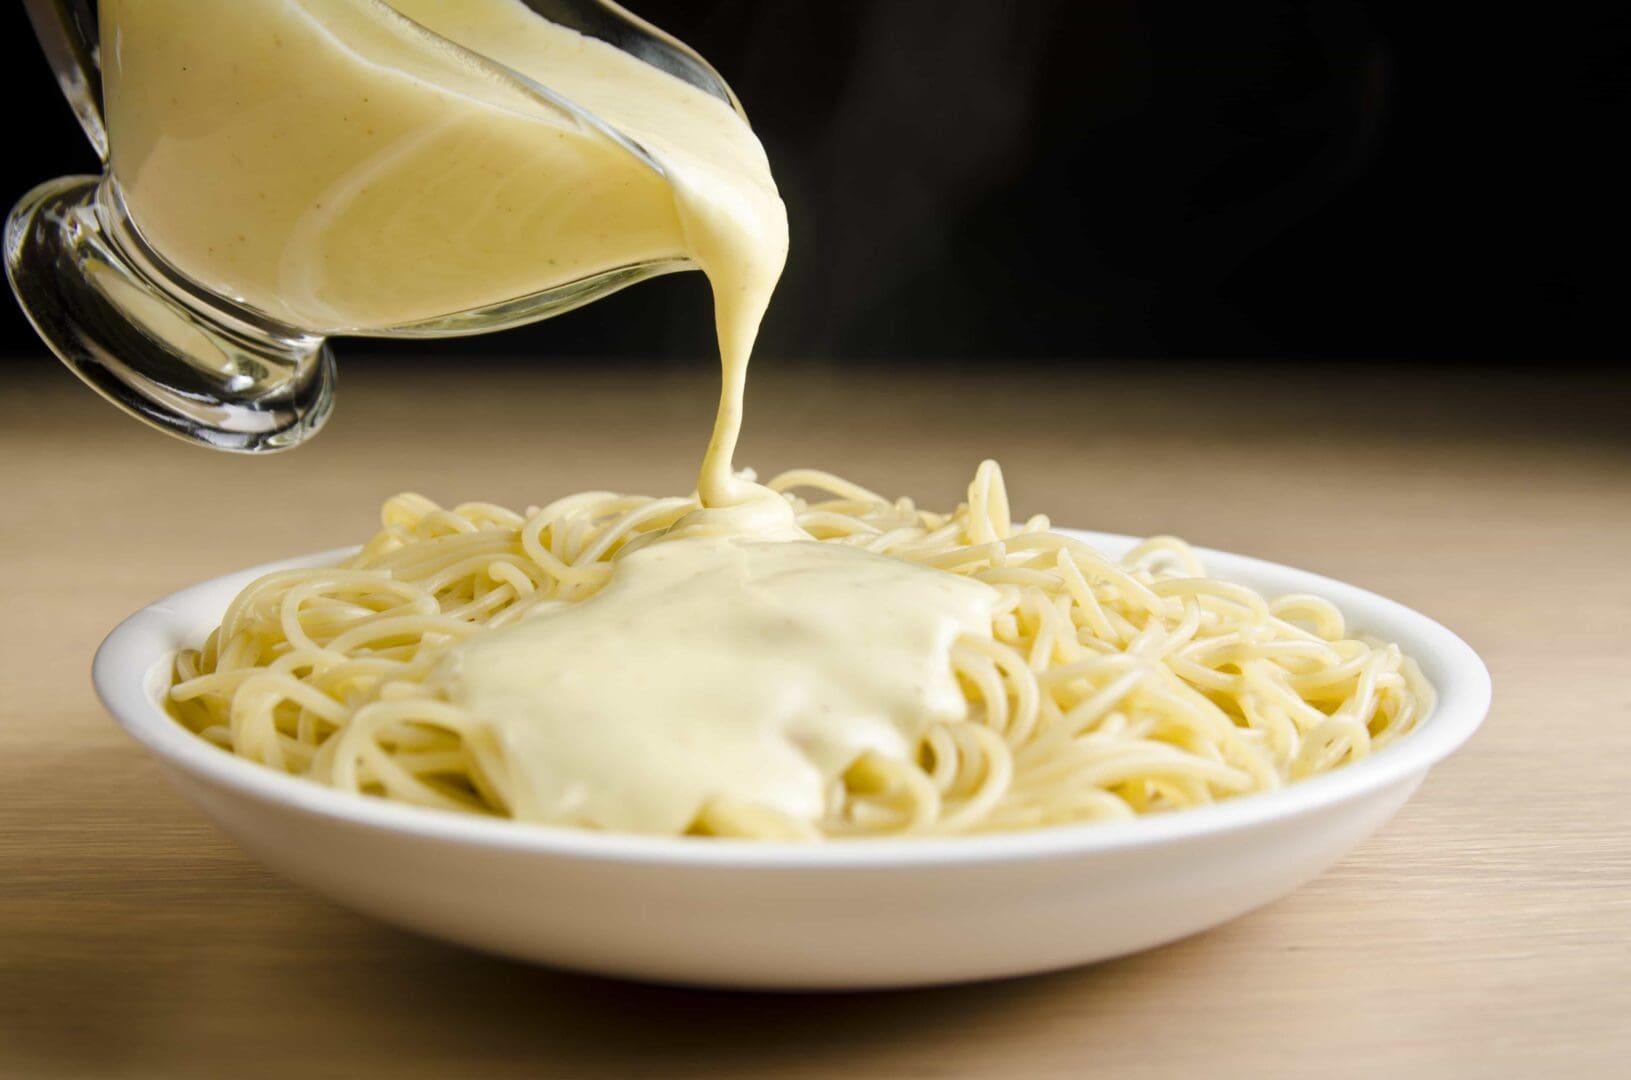 Feinste Drei-Käse-Sauce! (shutterstock.com / Tomo Bagaric)